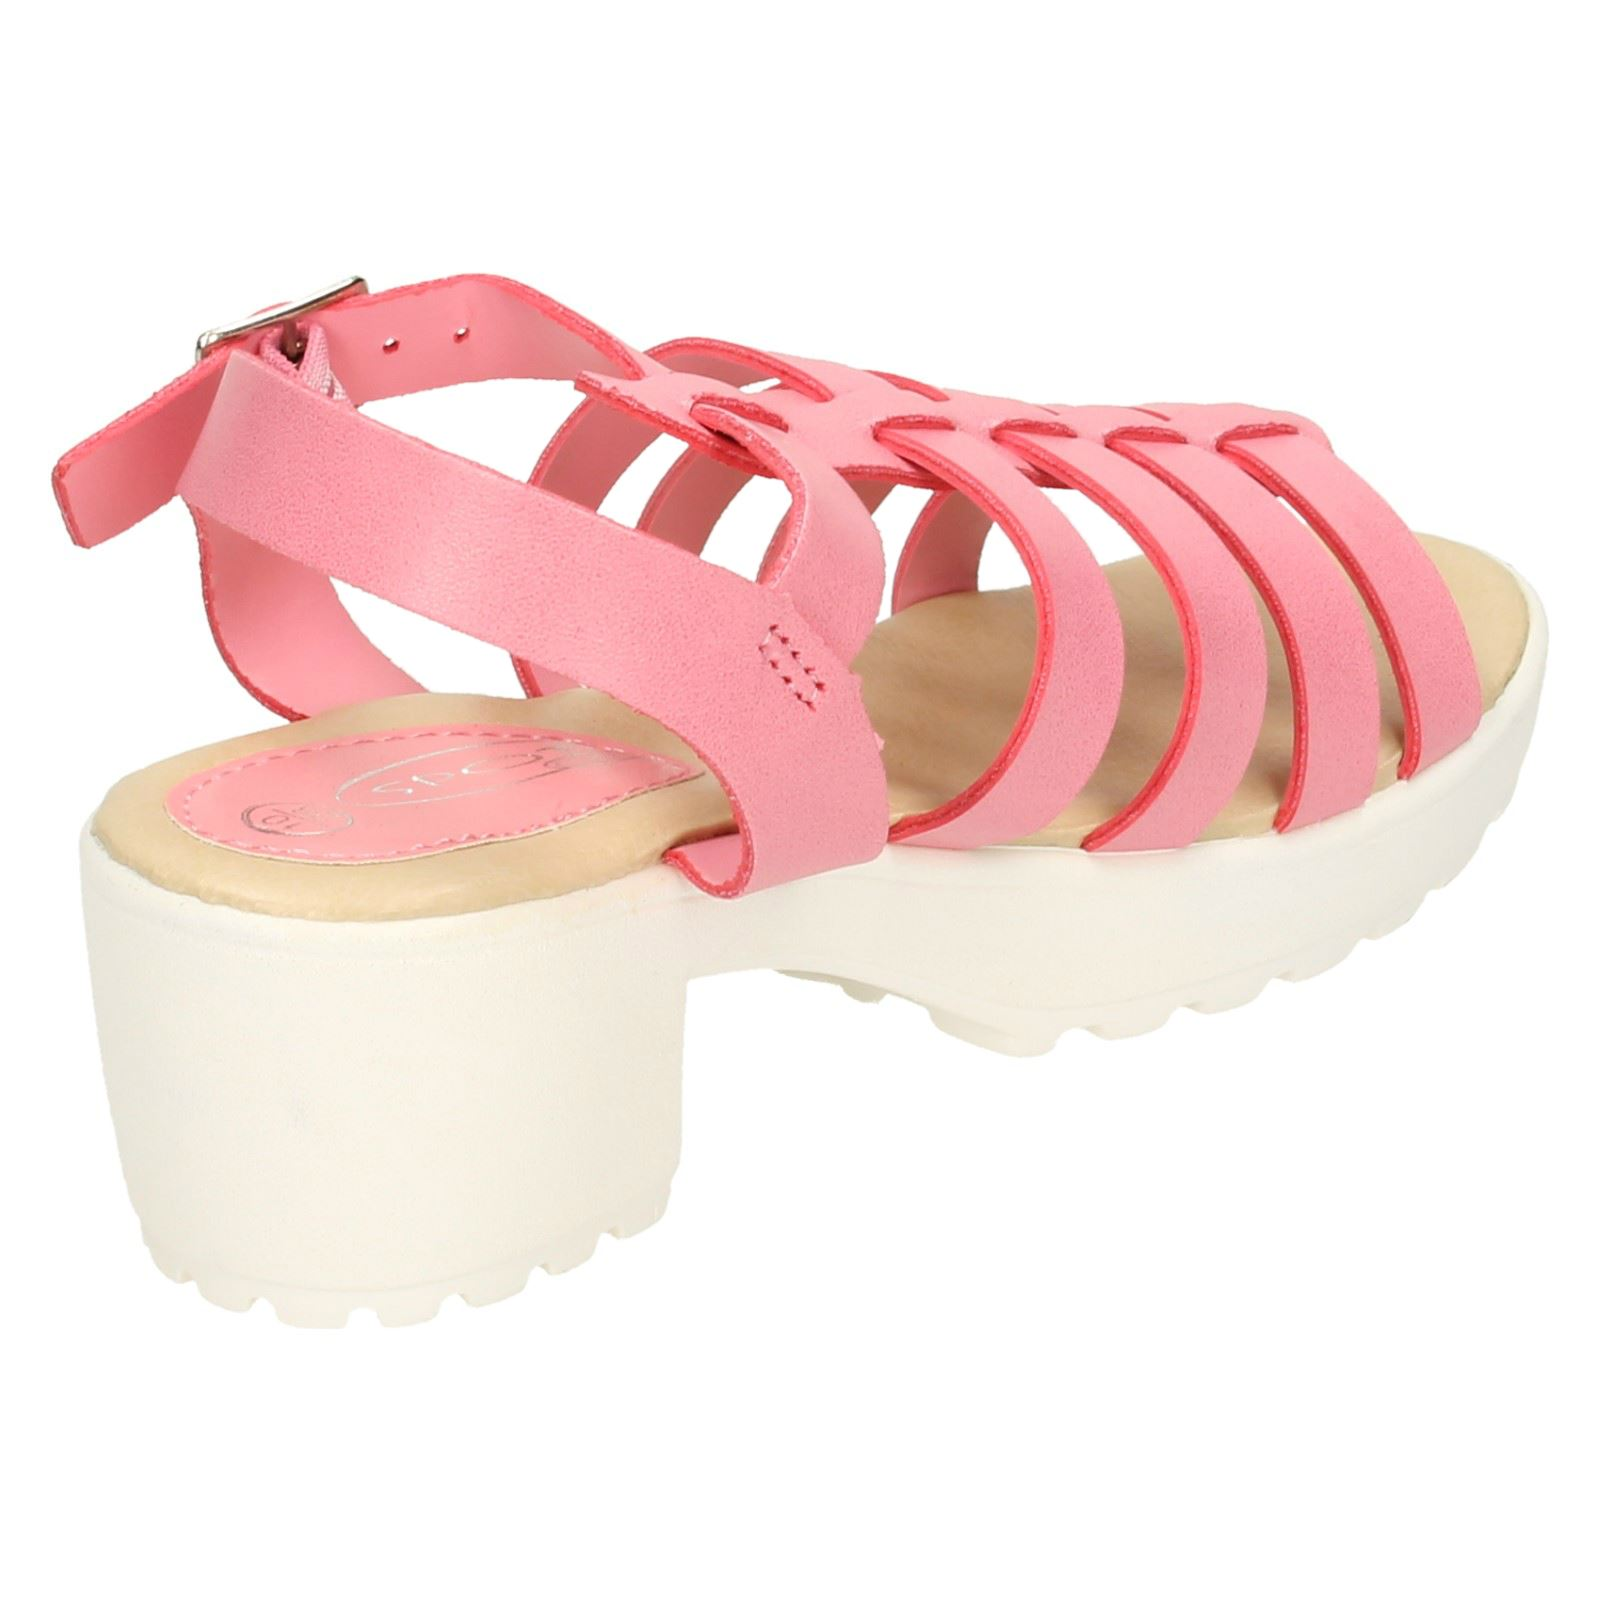 Girls Spot On Chunky Heeled Retro Look Sandals